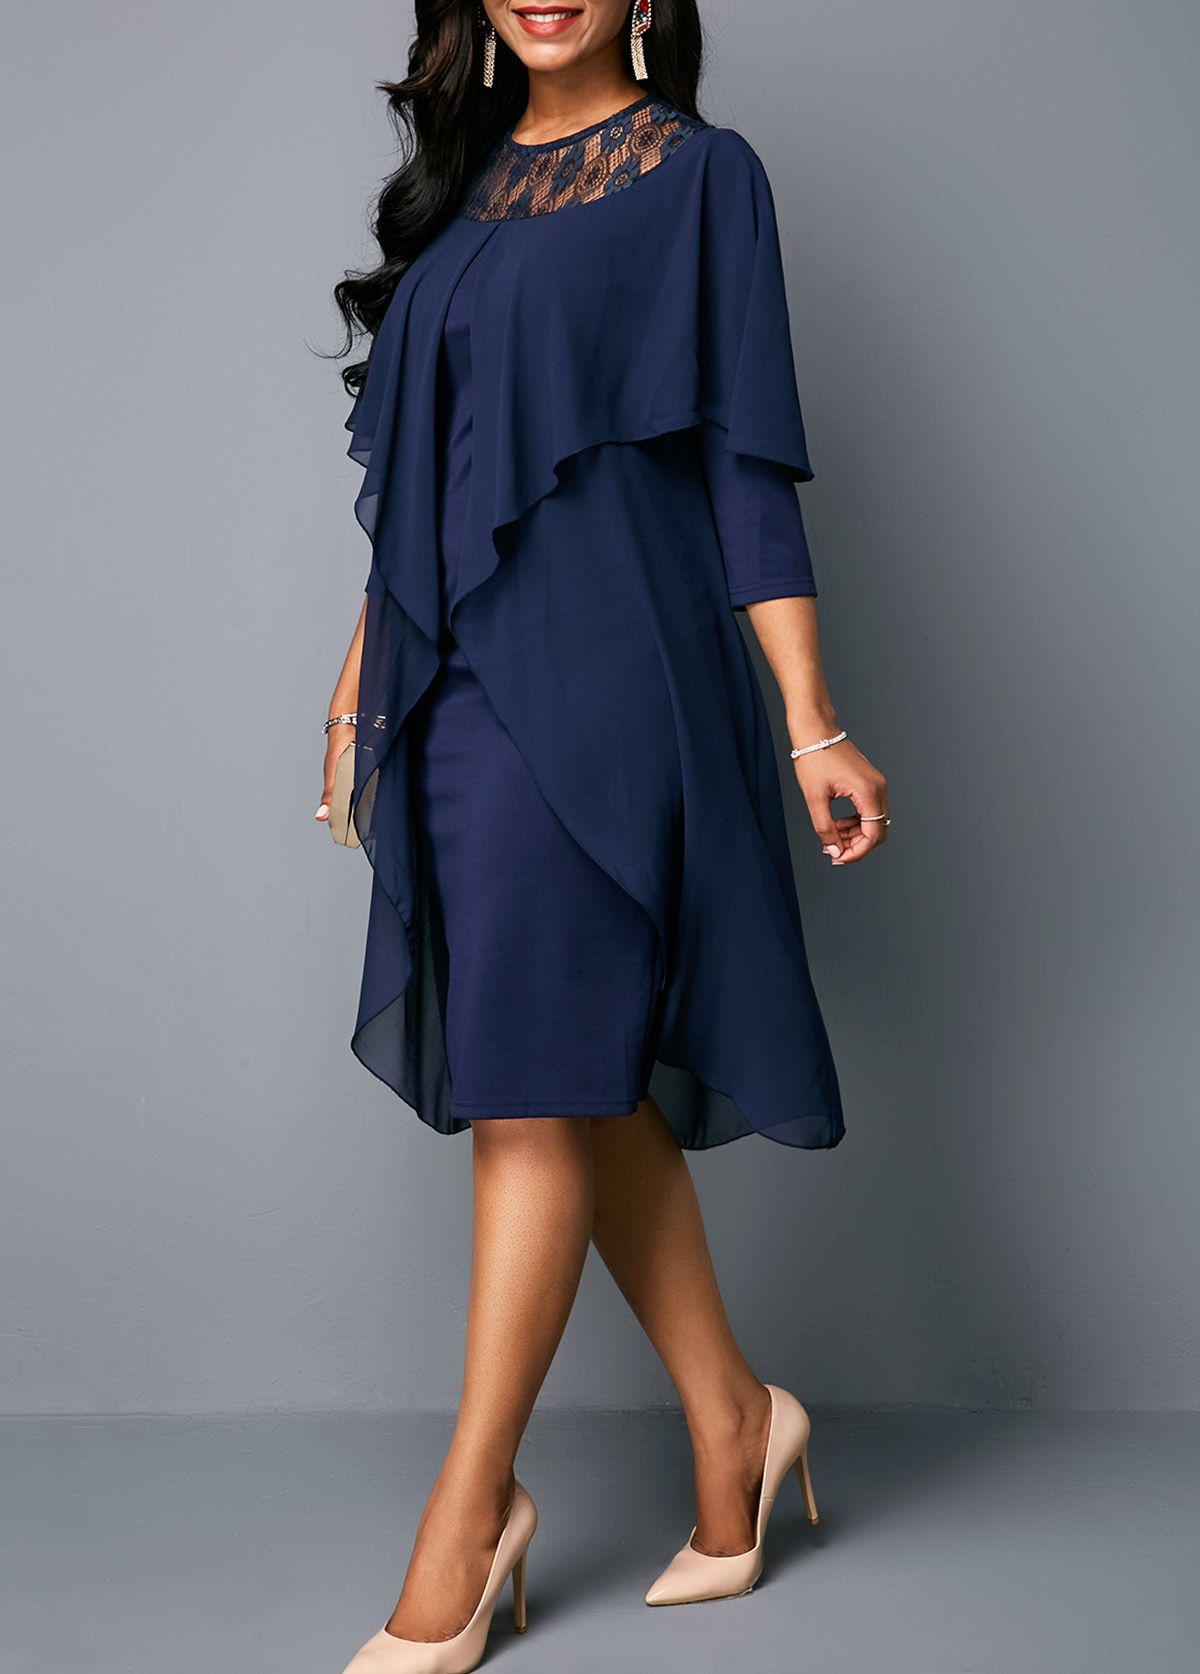 Three quarter sleeve round neck chiffon dress in dresses